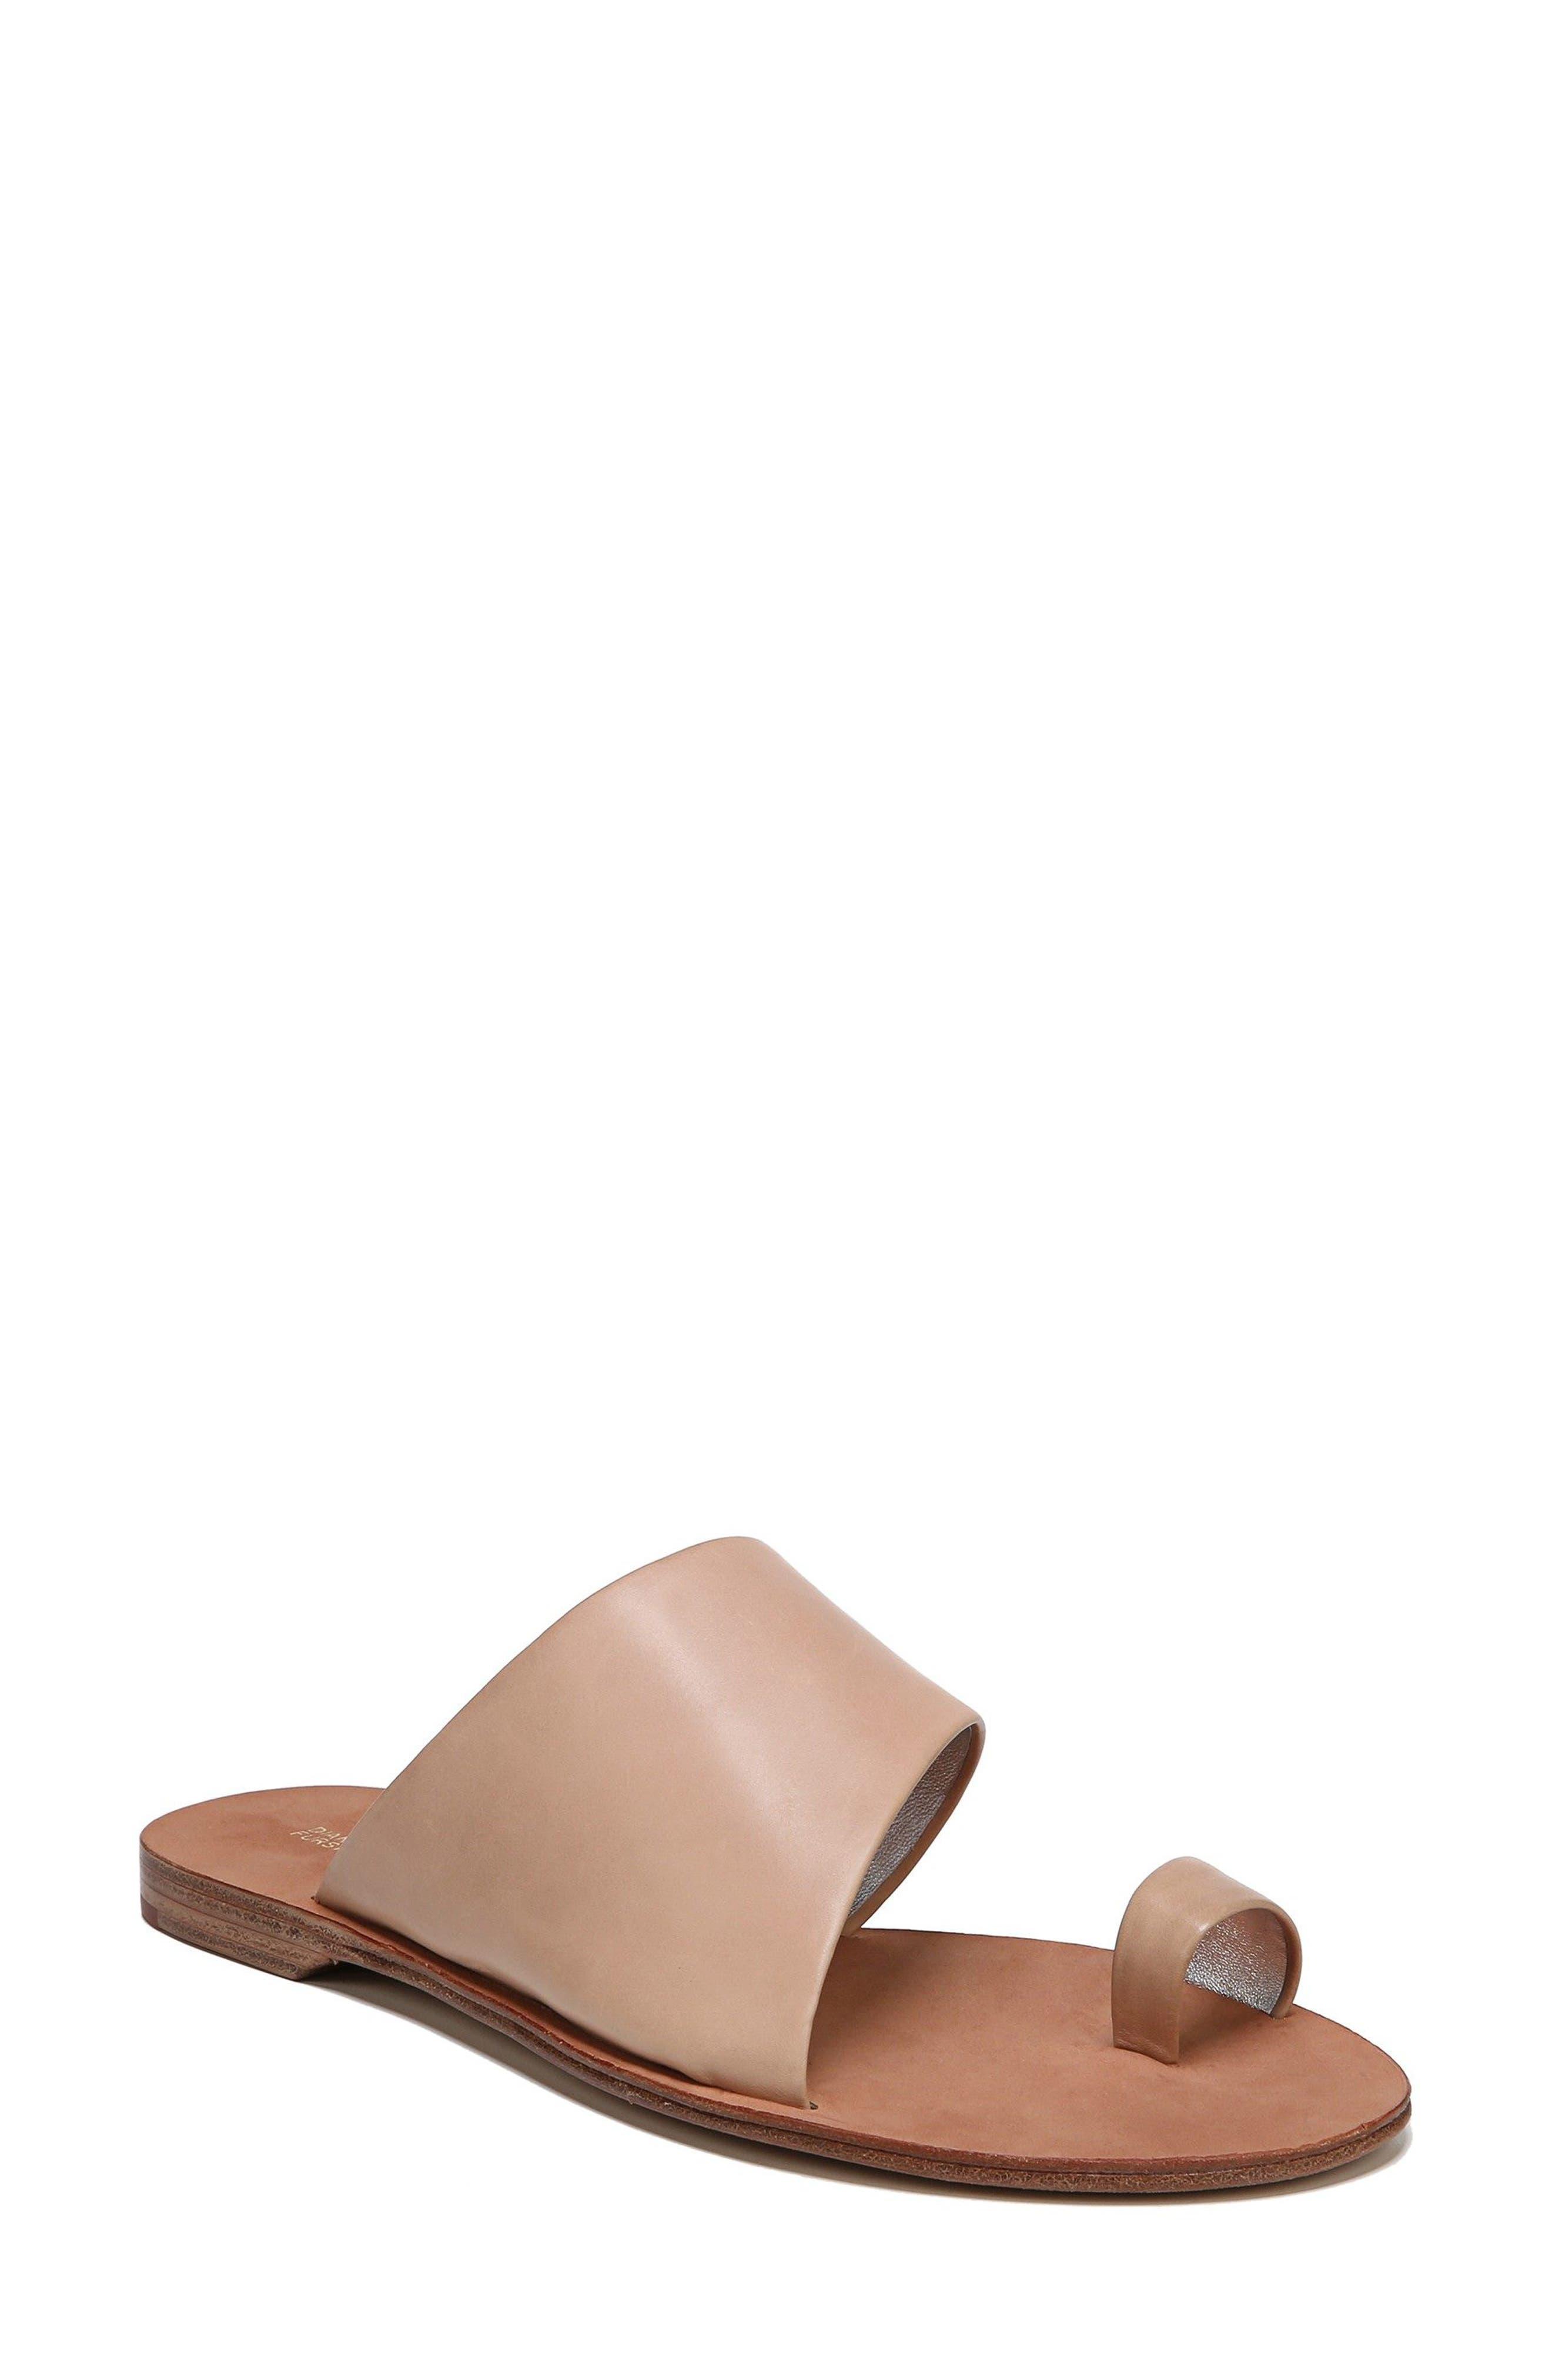 Brittany Asymmetrical Flat Sandal,                             Main thumbnail 1, color,                             202